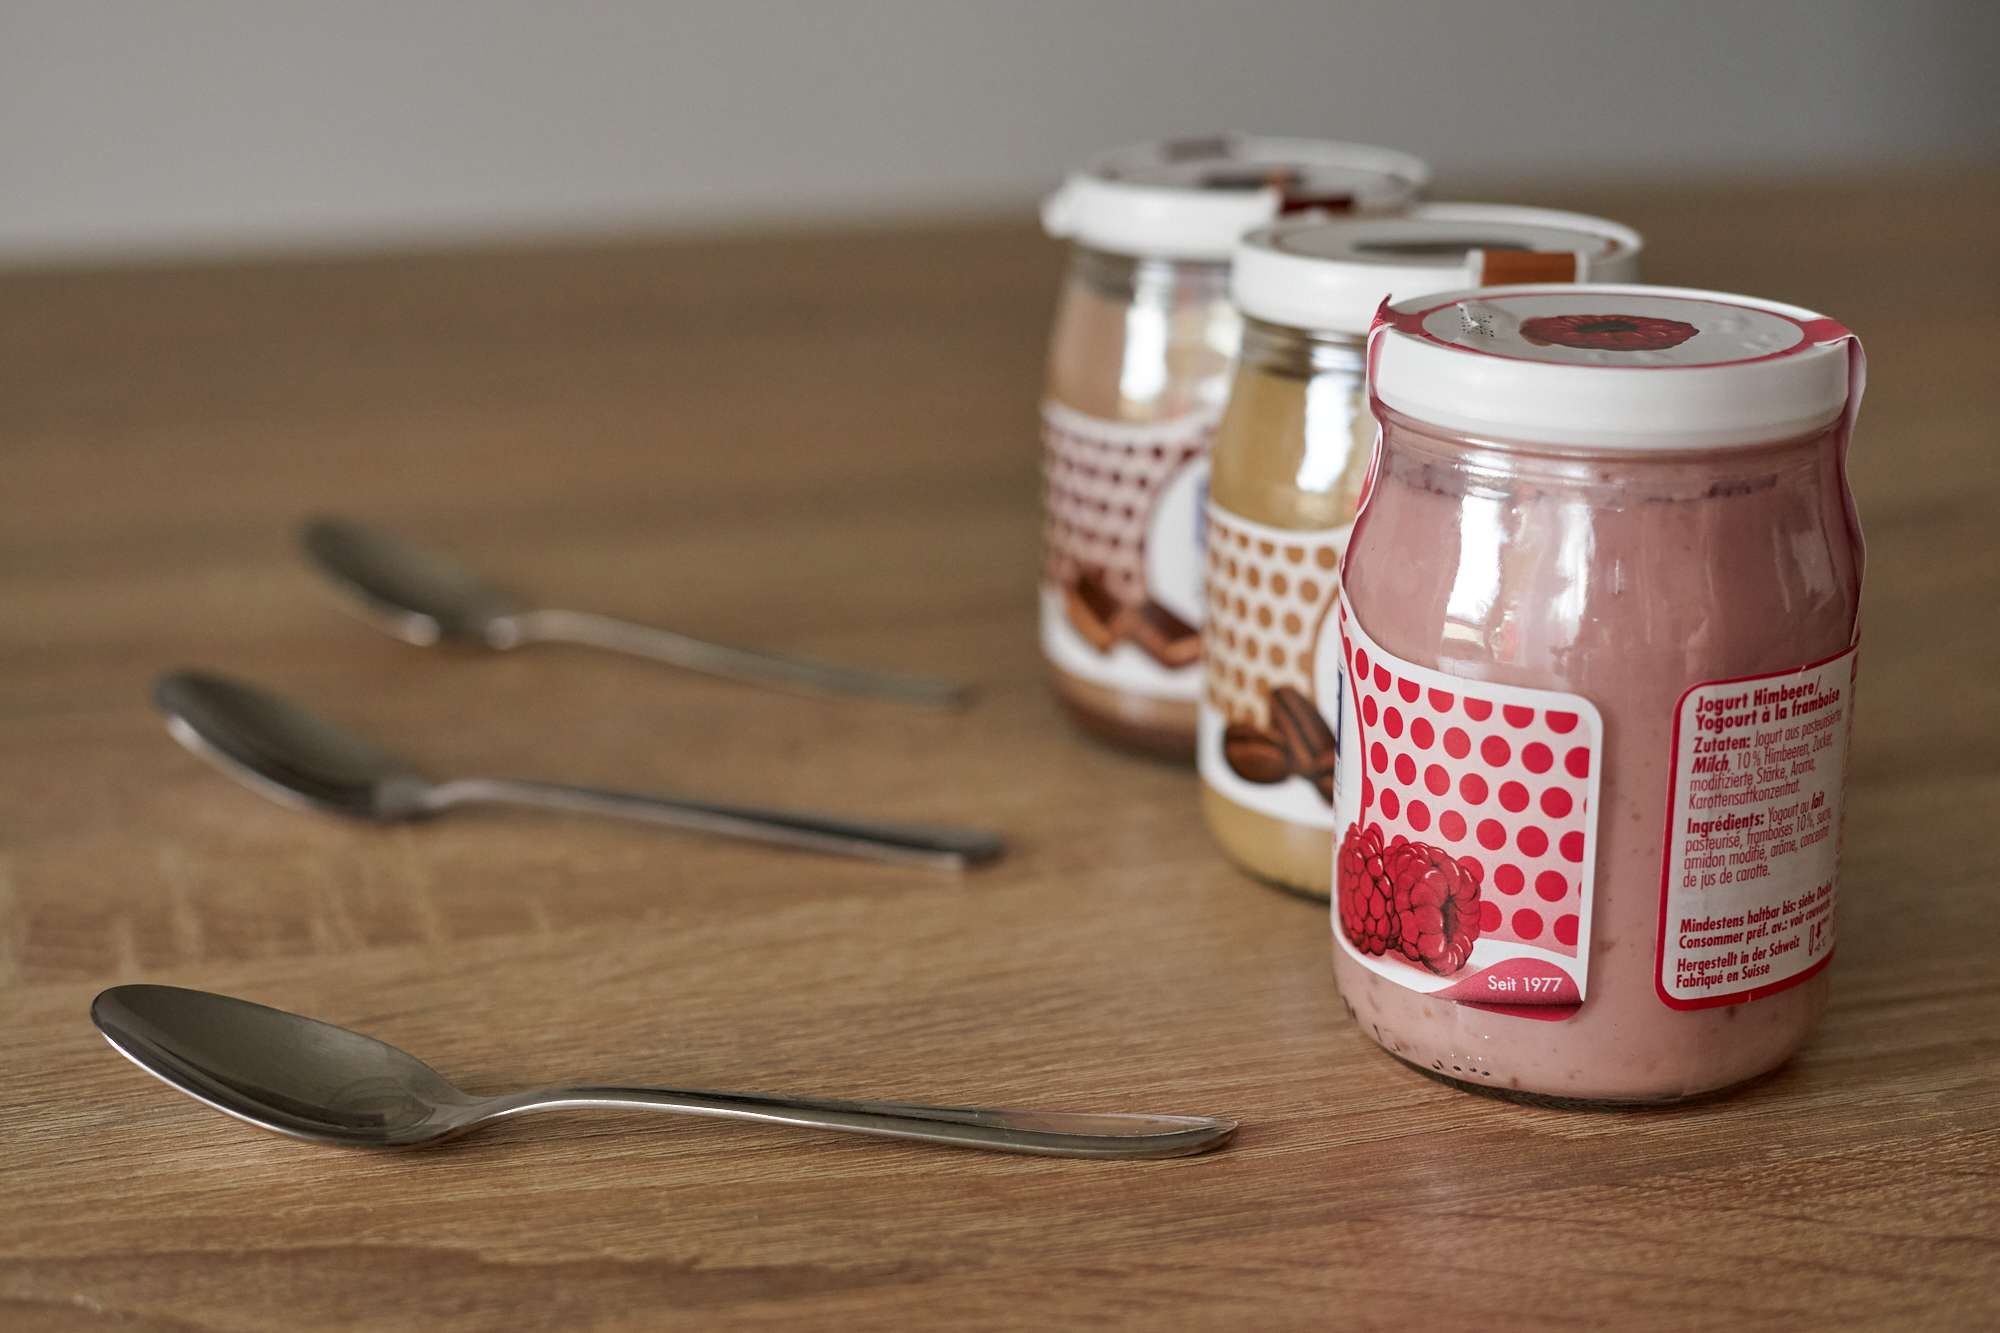 three glass jars of yogurt with three spoons on wooden table